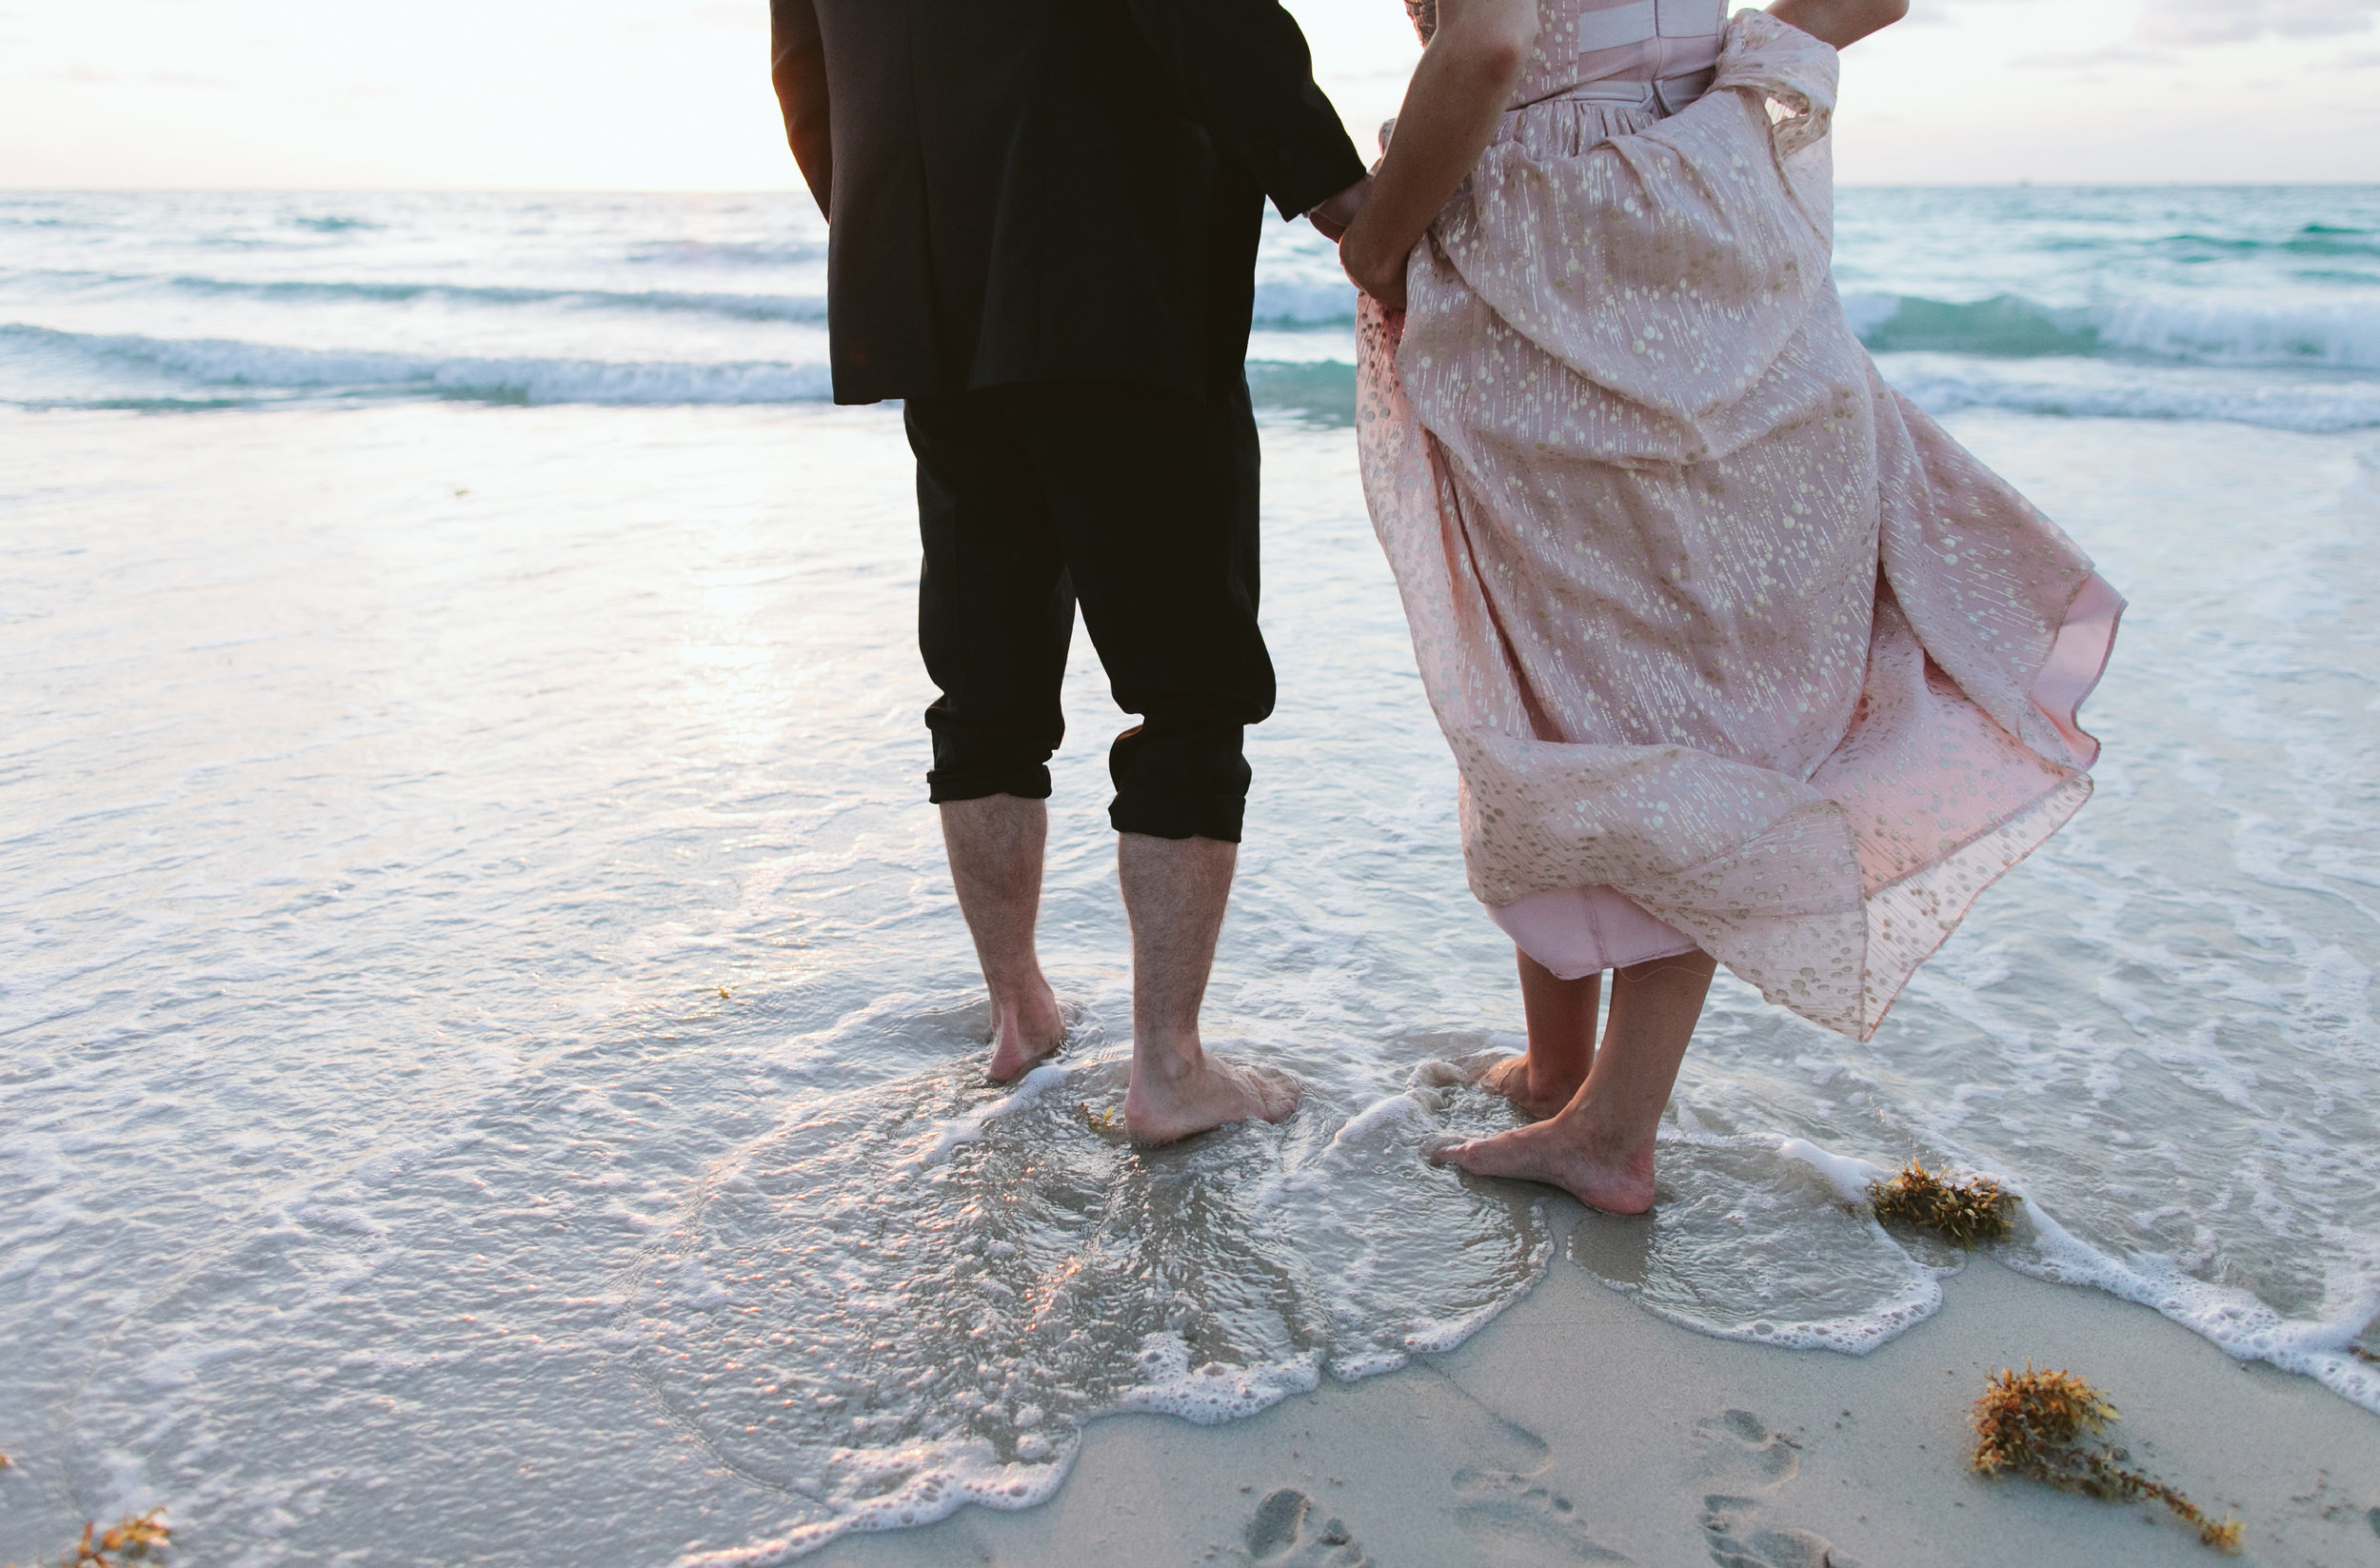 Meli + Mike South Pointe Park South Beach Miami Engagement Shoot16.jpg